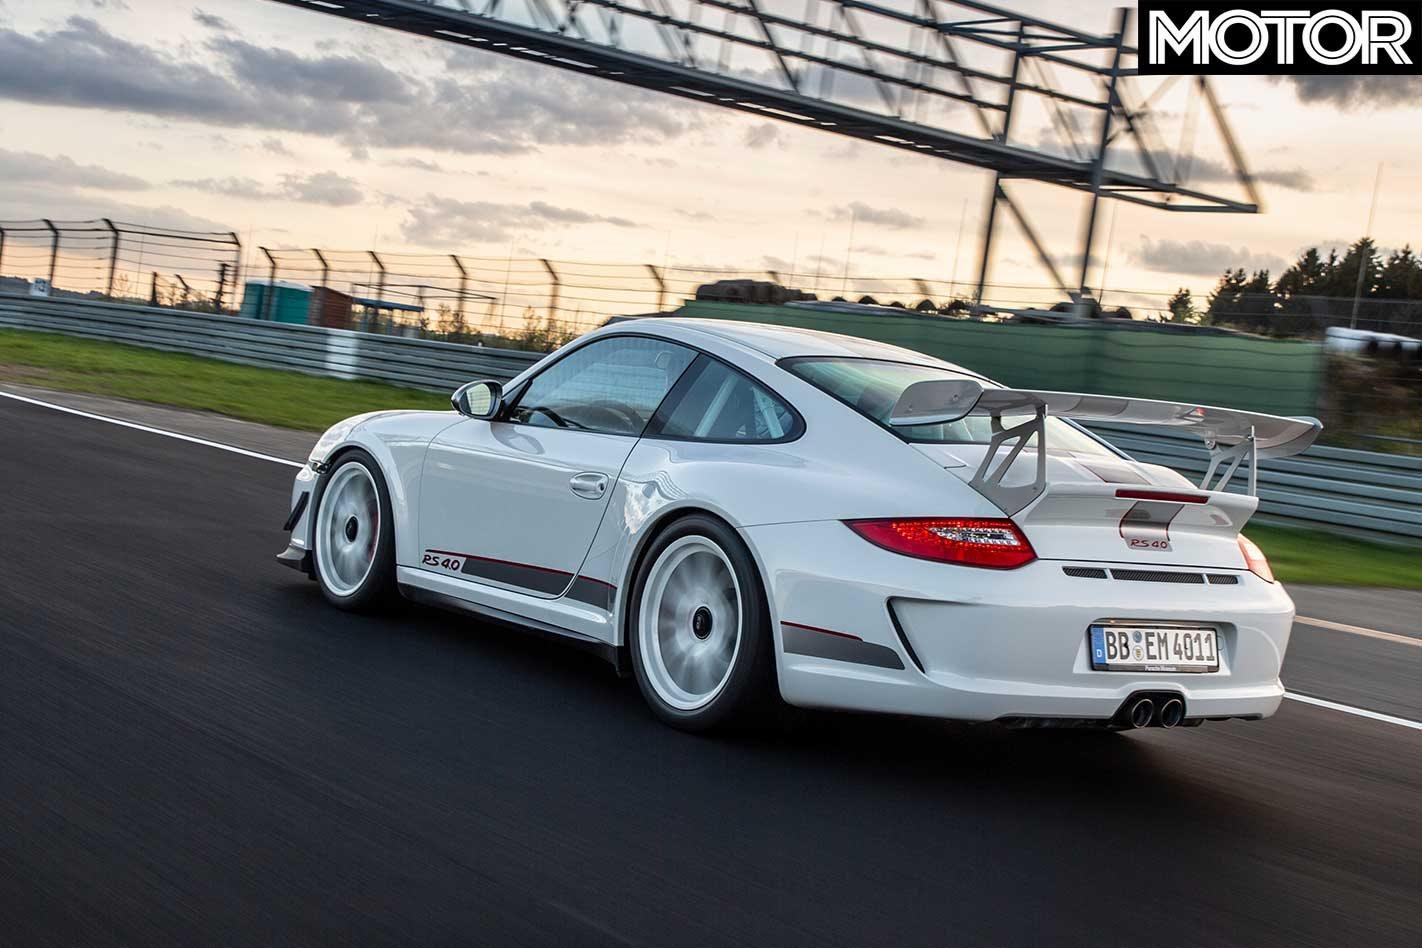 2011 Porsche 911 997 GT3 RS 4.0 - The Five Greatest 911s